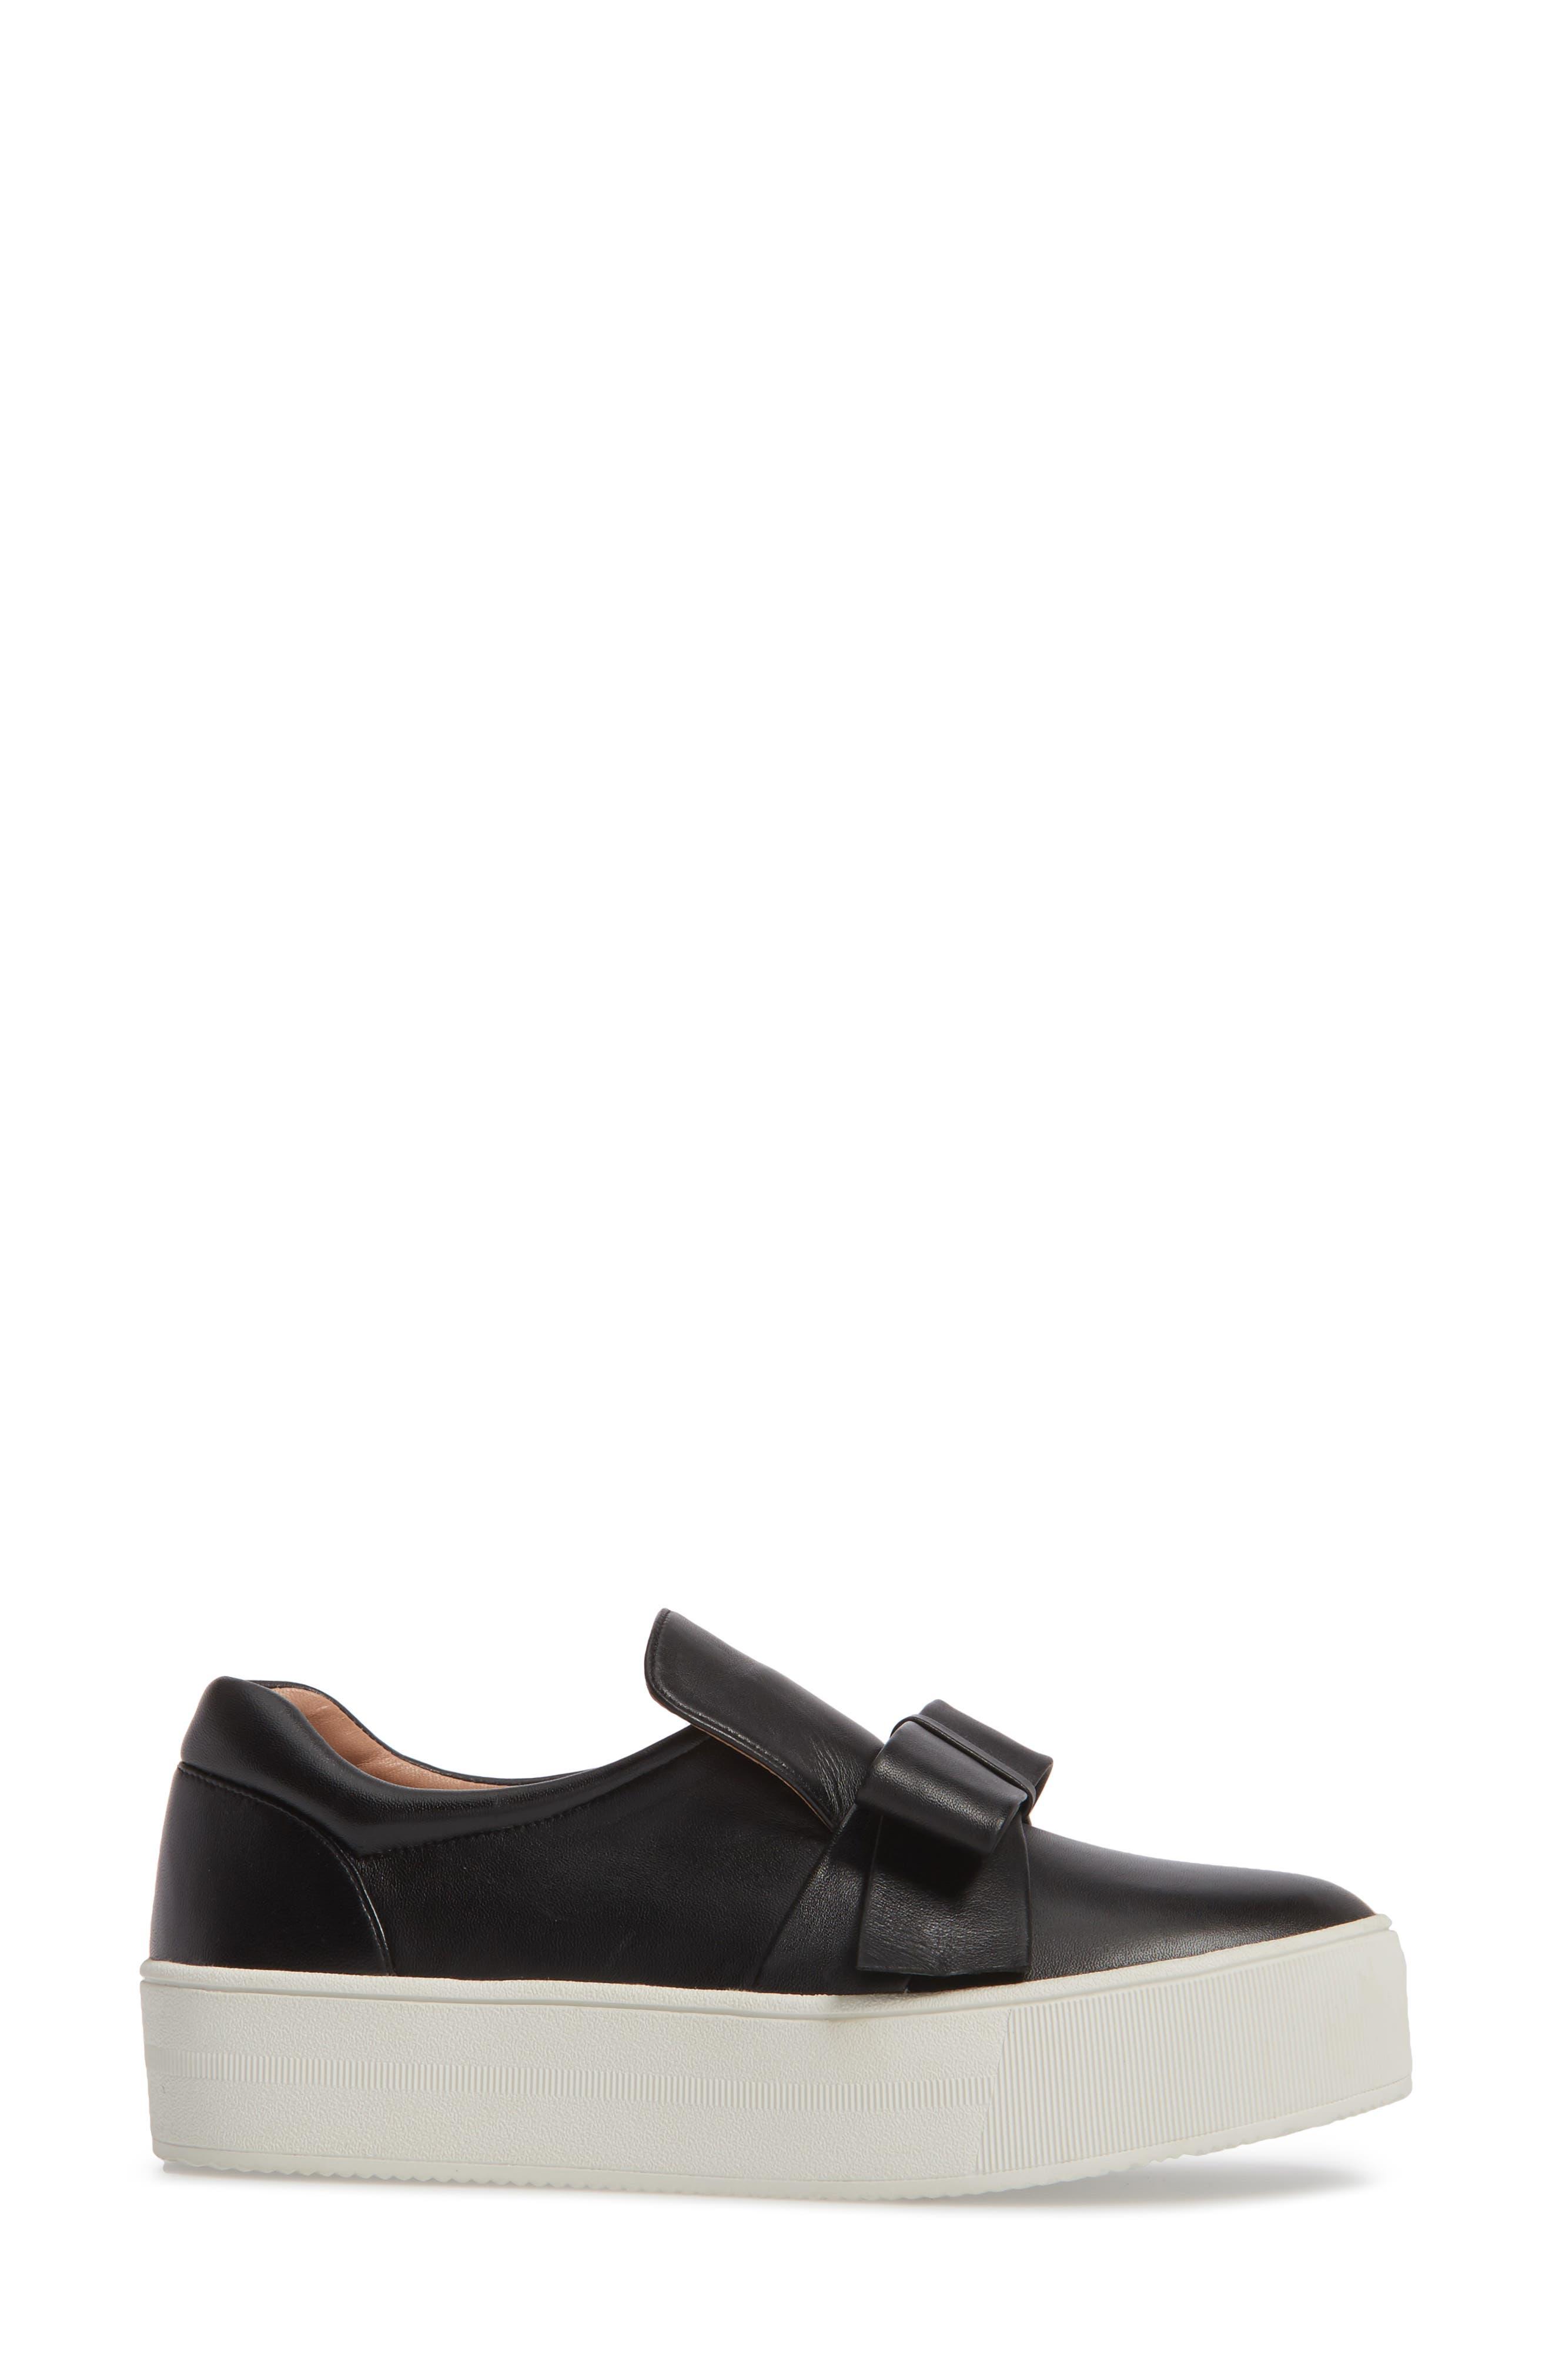 Vania Bow Platform Sneaker,                             Alternate thumbnail 3, color,                             Black Leather